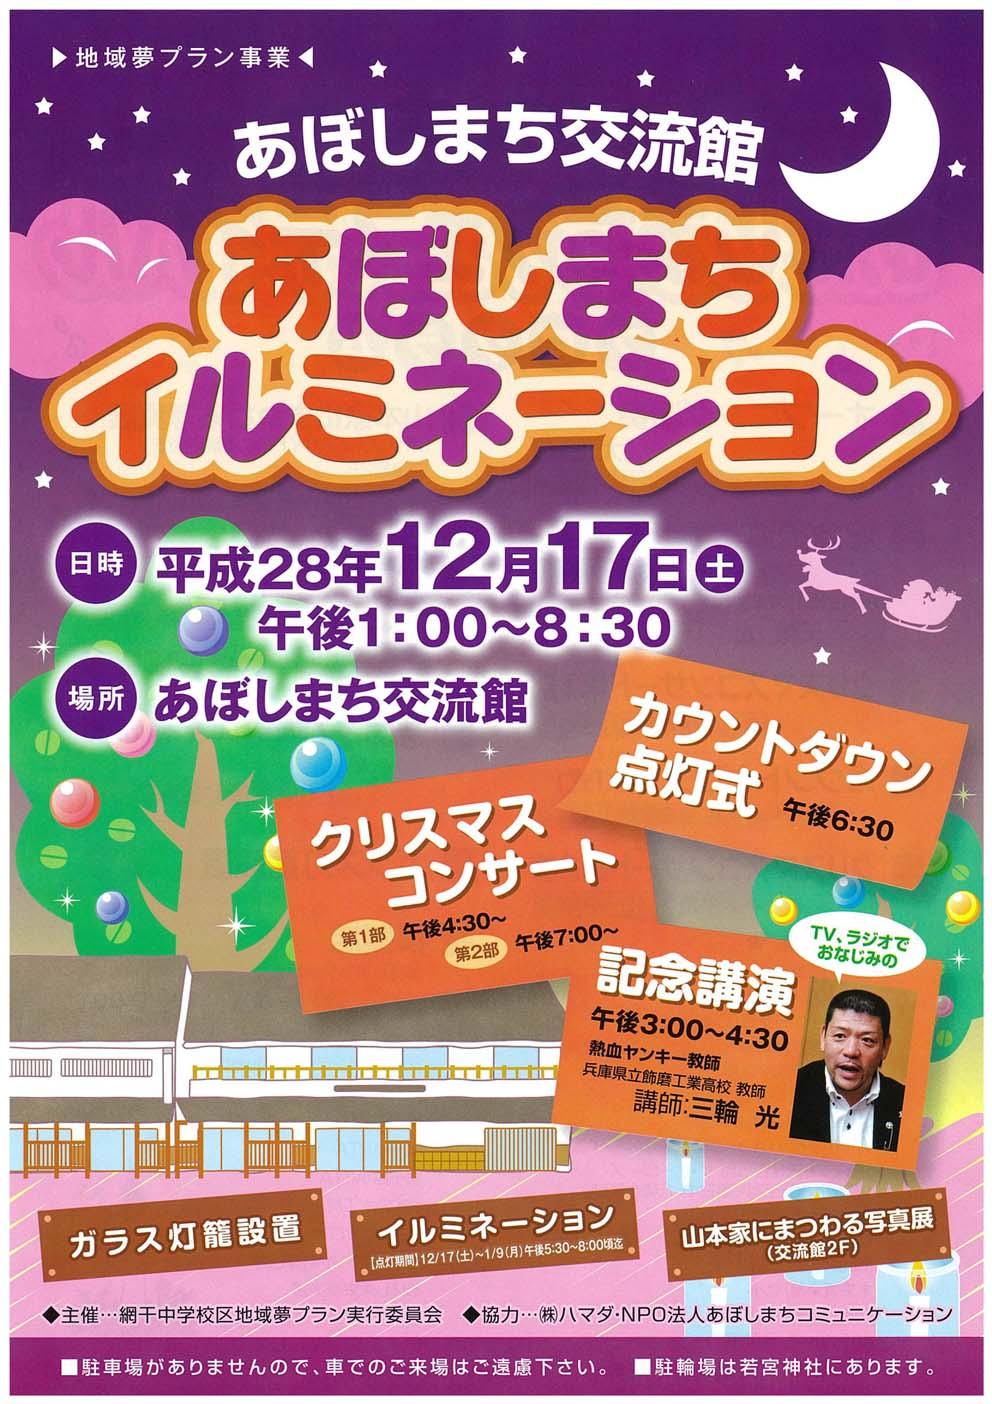 http://aboshimachi.com/akari16-a.jpg